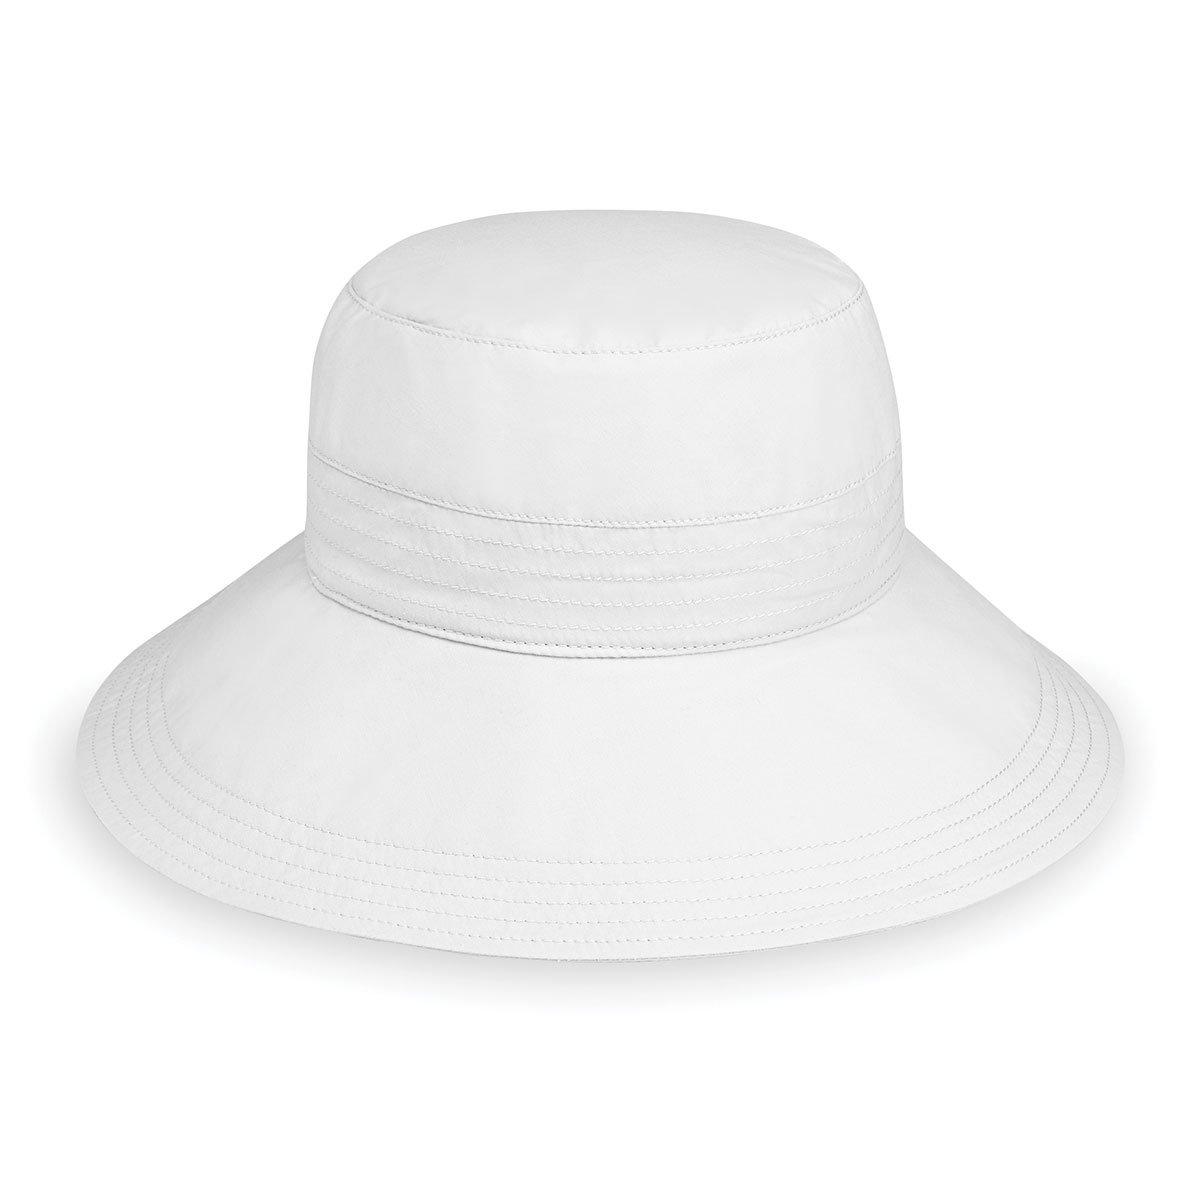 83f67b9cef8 Wallaroo Women s Piper Hat - UPF 50+ - Packable - One Size (Beige)   Amazon.co.uk  Clothing